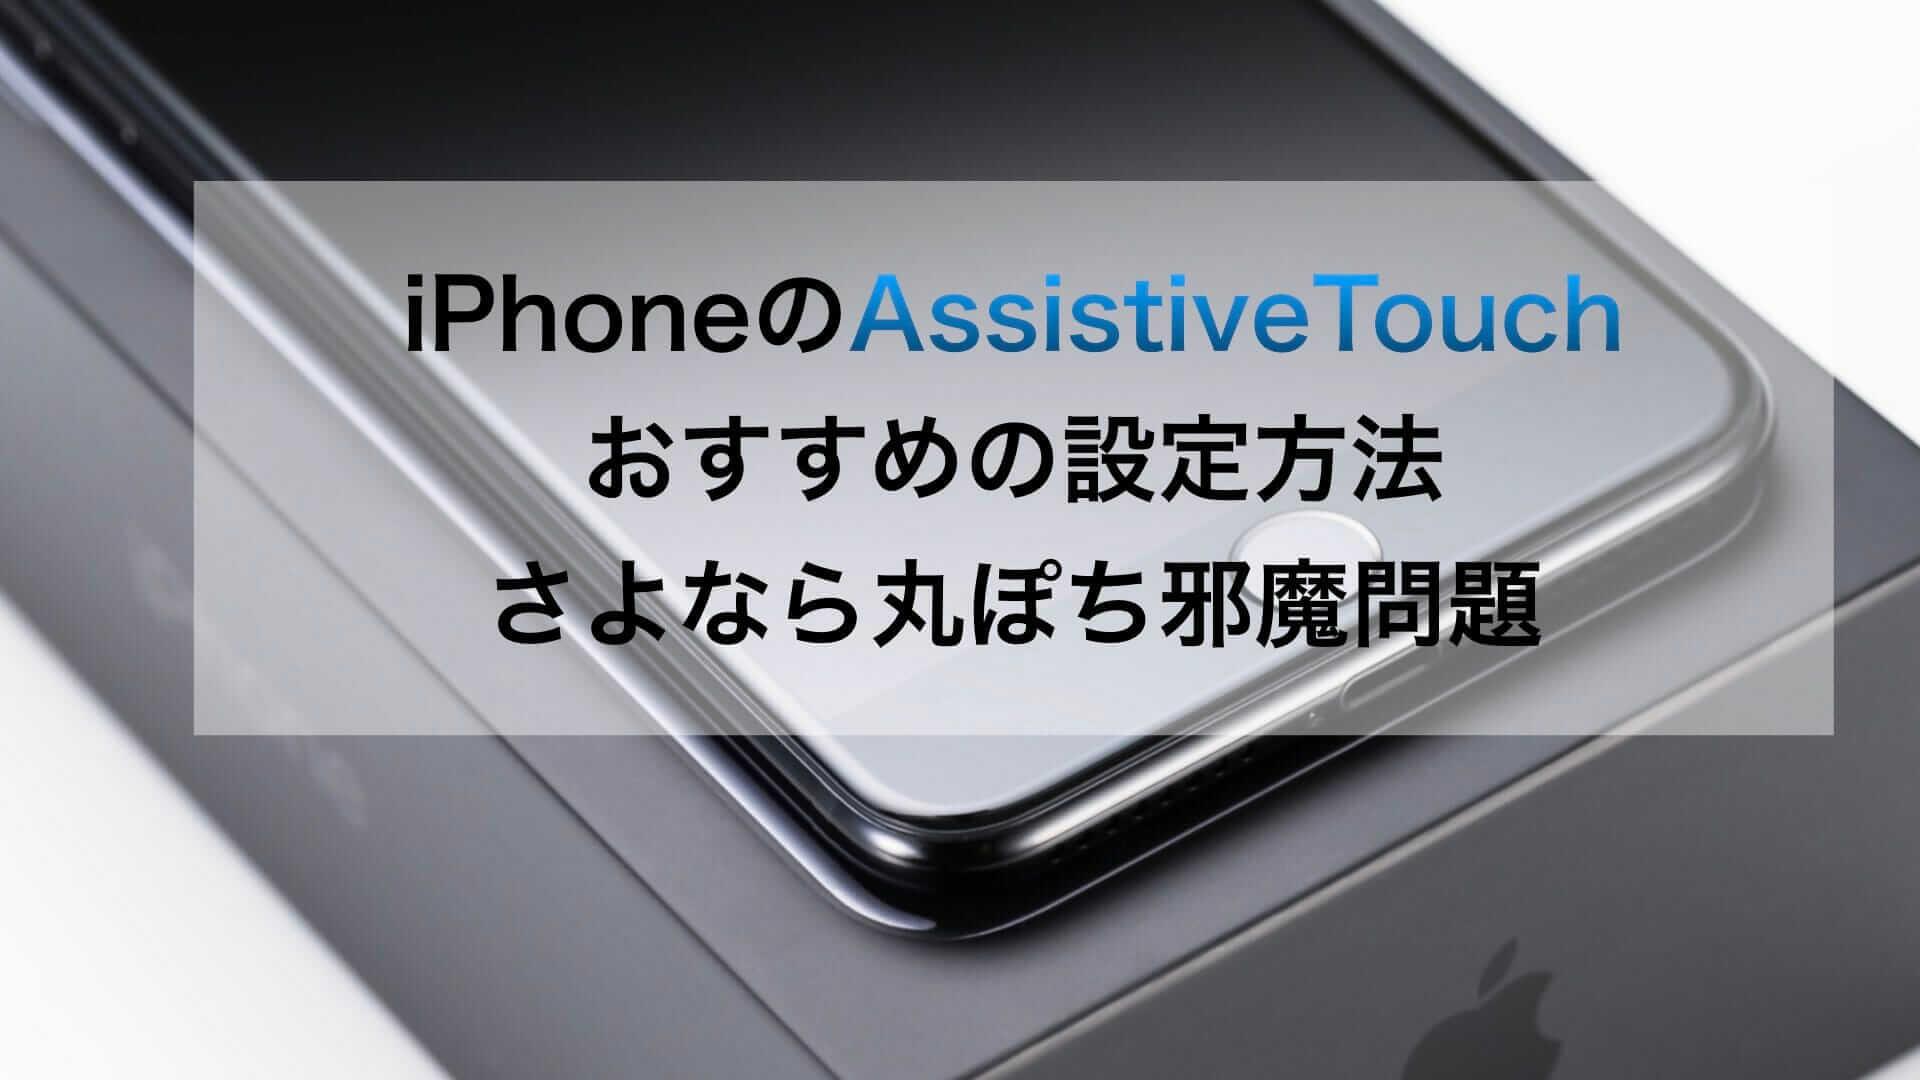 AssistiveTouchのすすめ:便利で邪魔ならないおすすめのiPhone設定方法